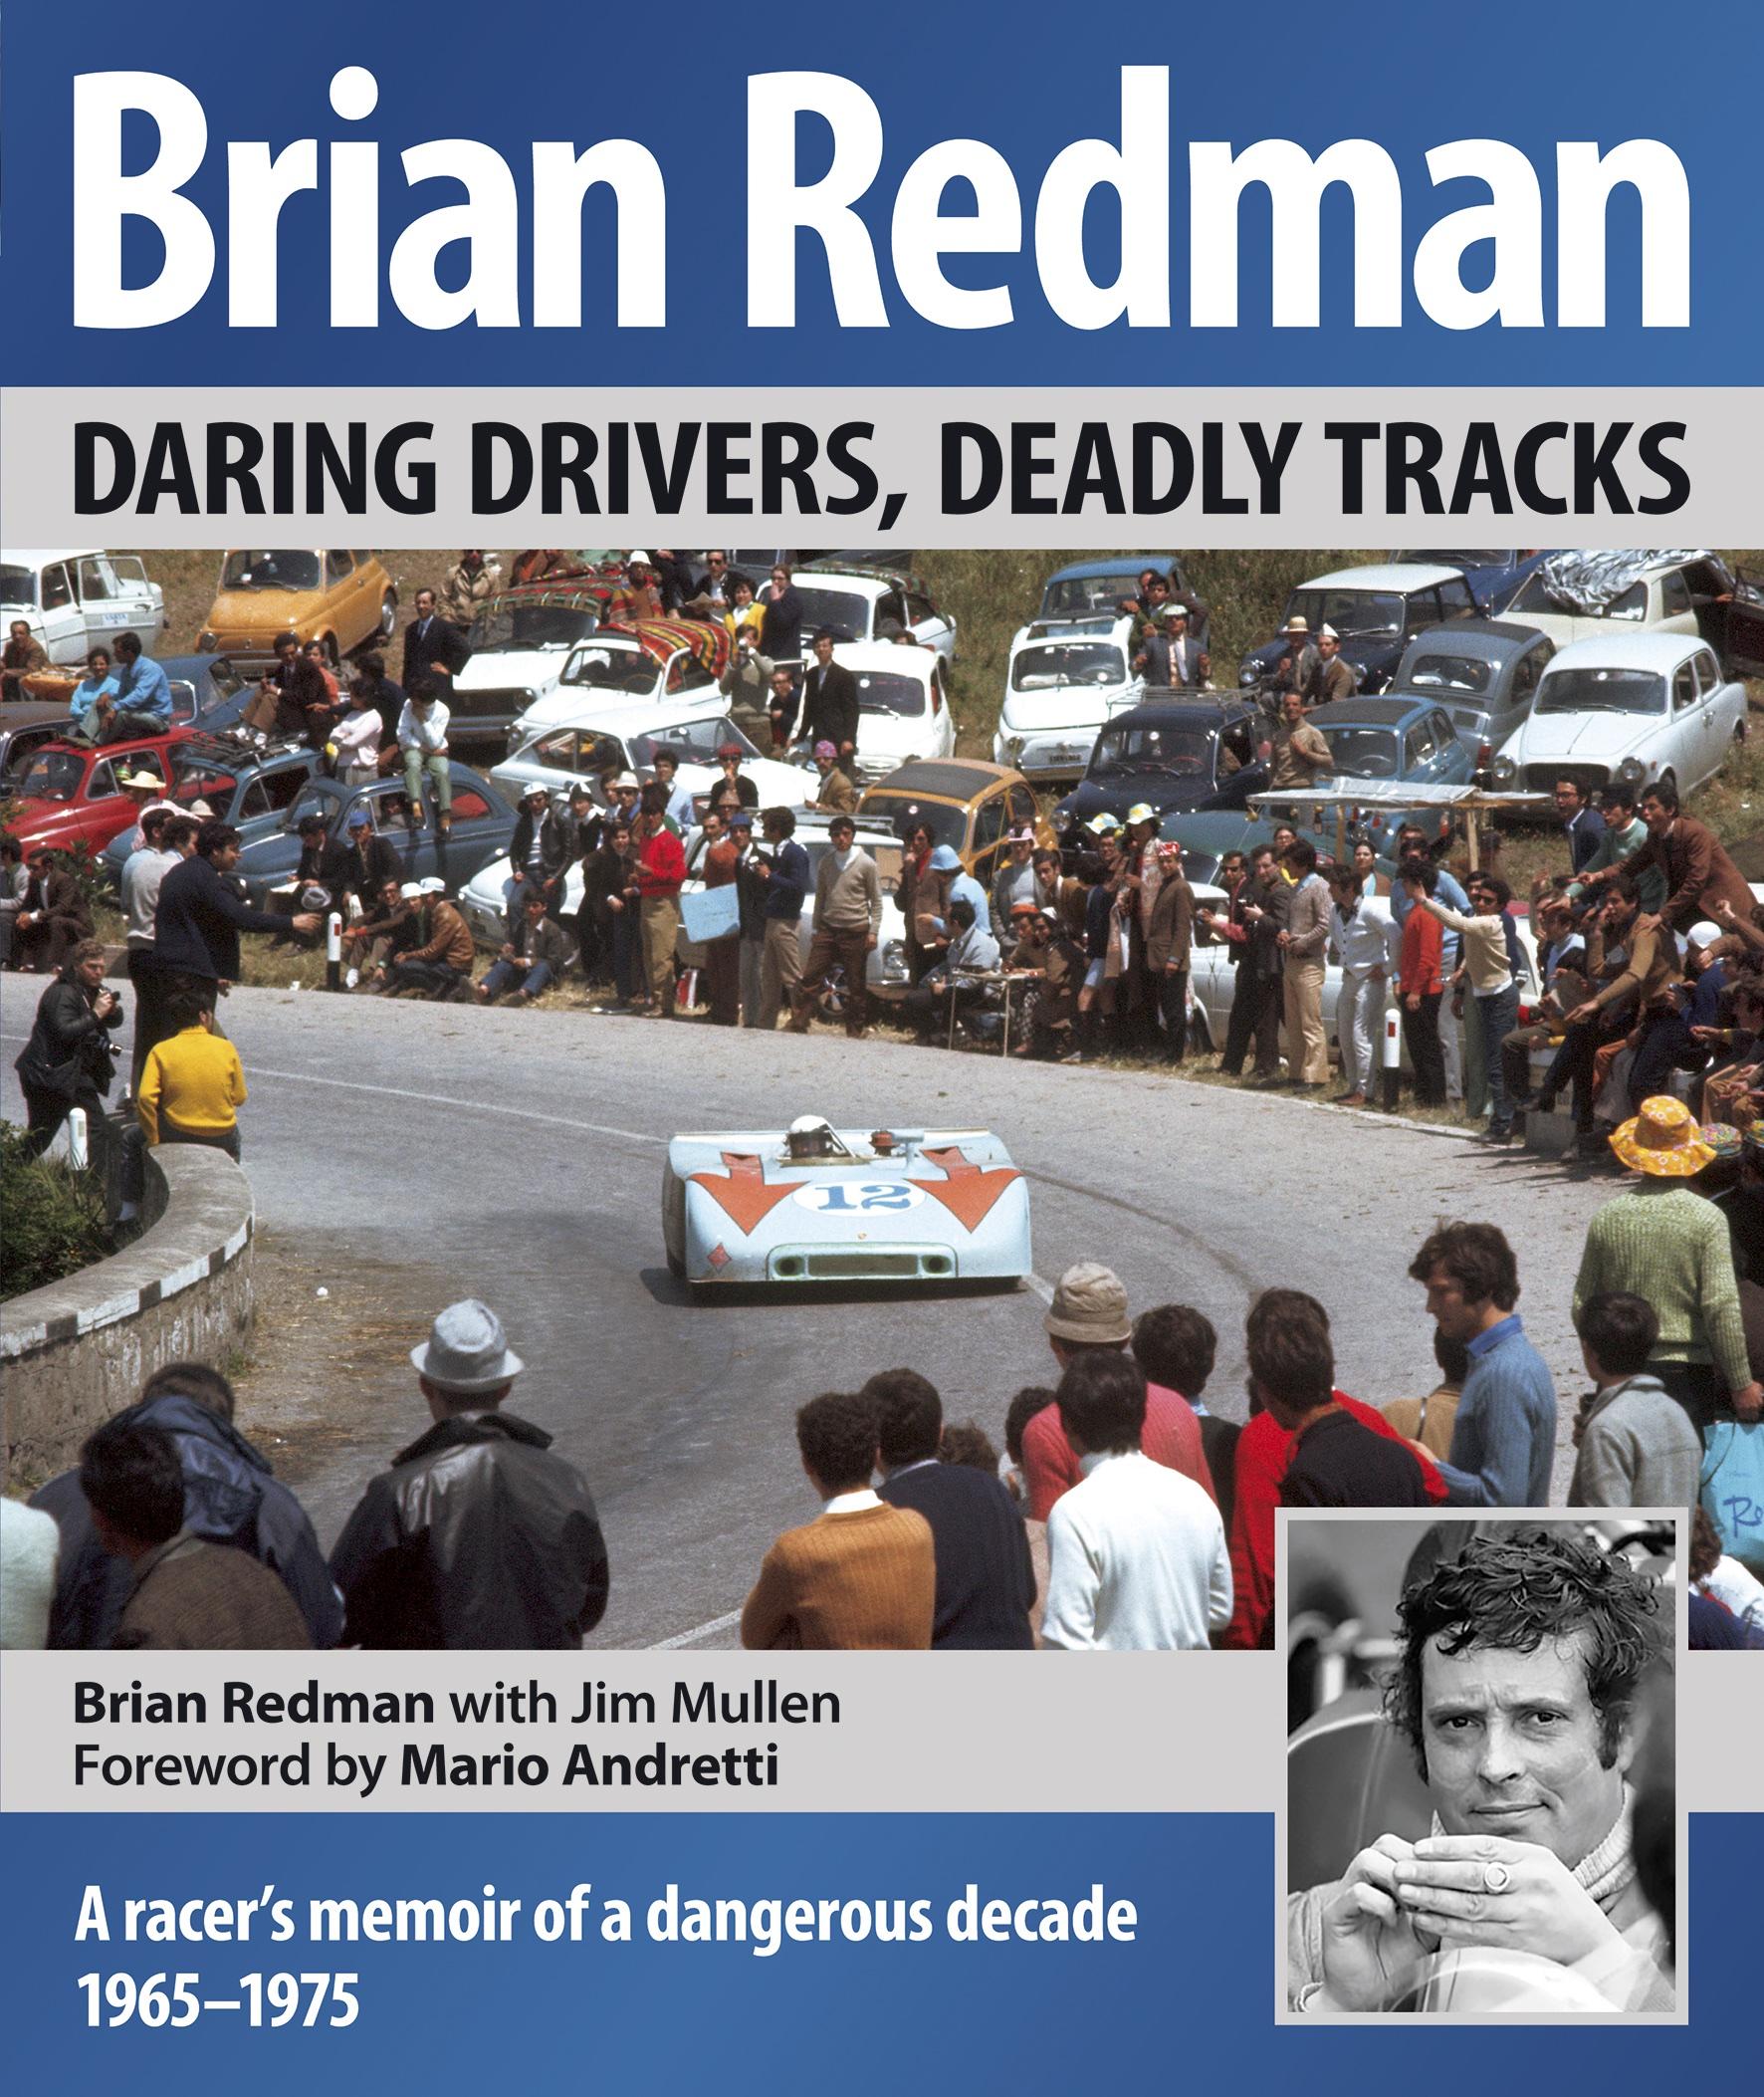 Brian Redman's Daring Drivers, Deadly Tracks